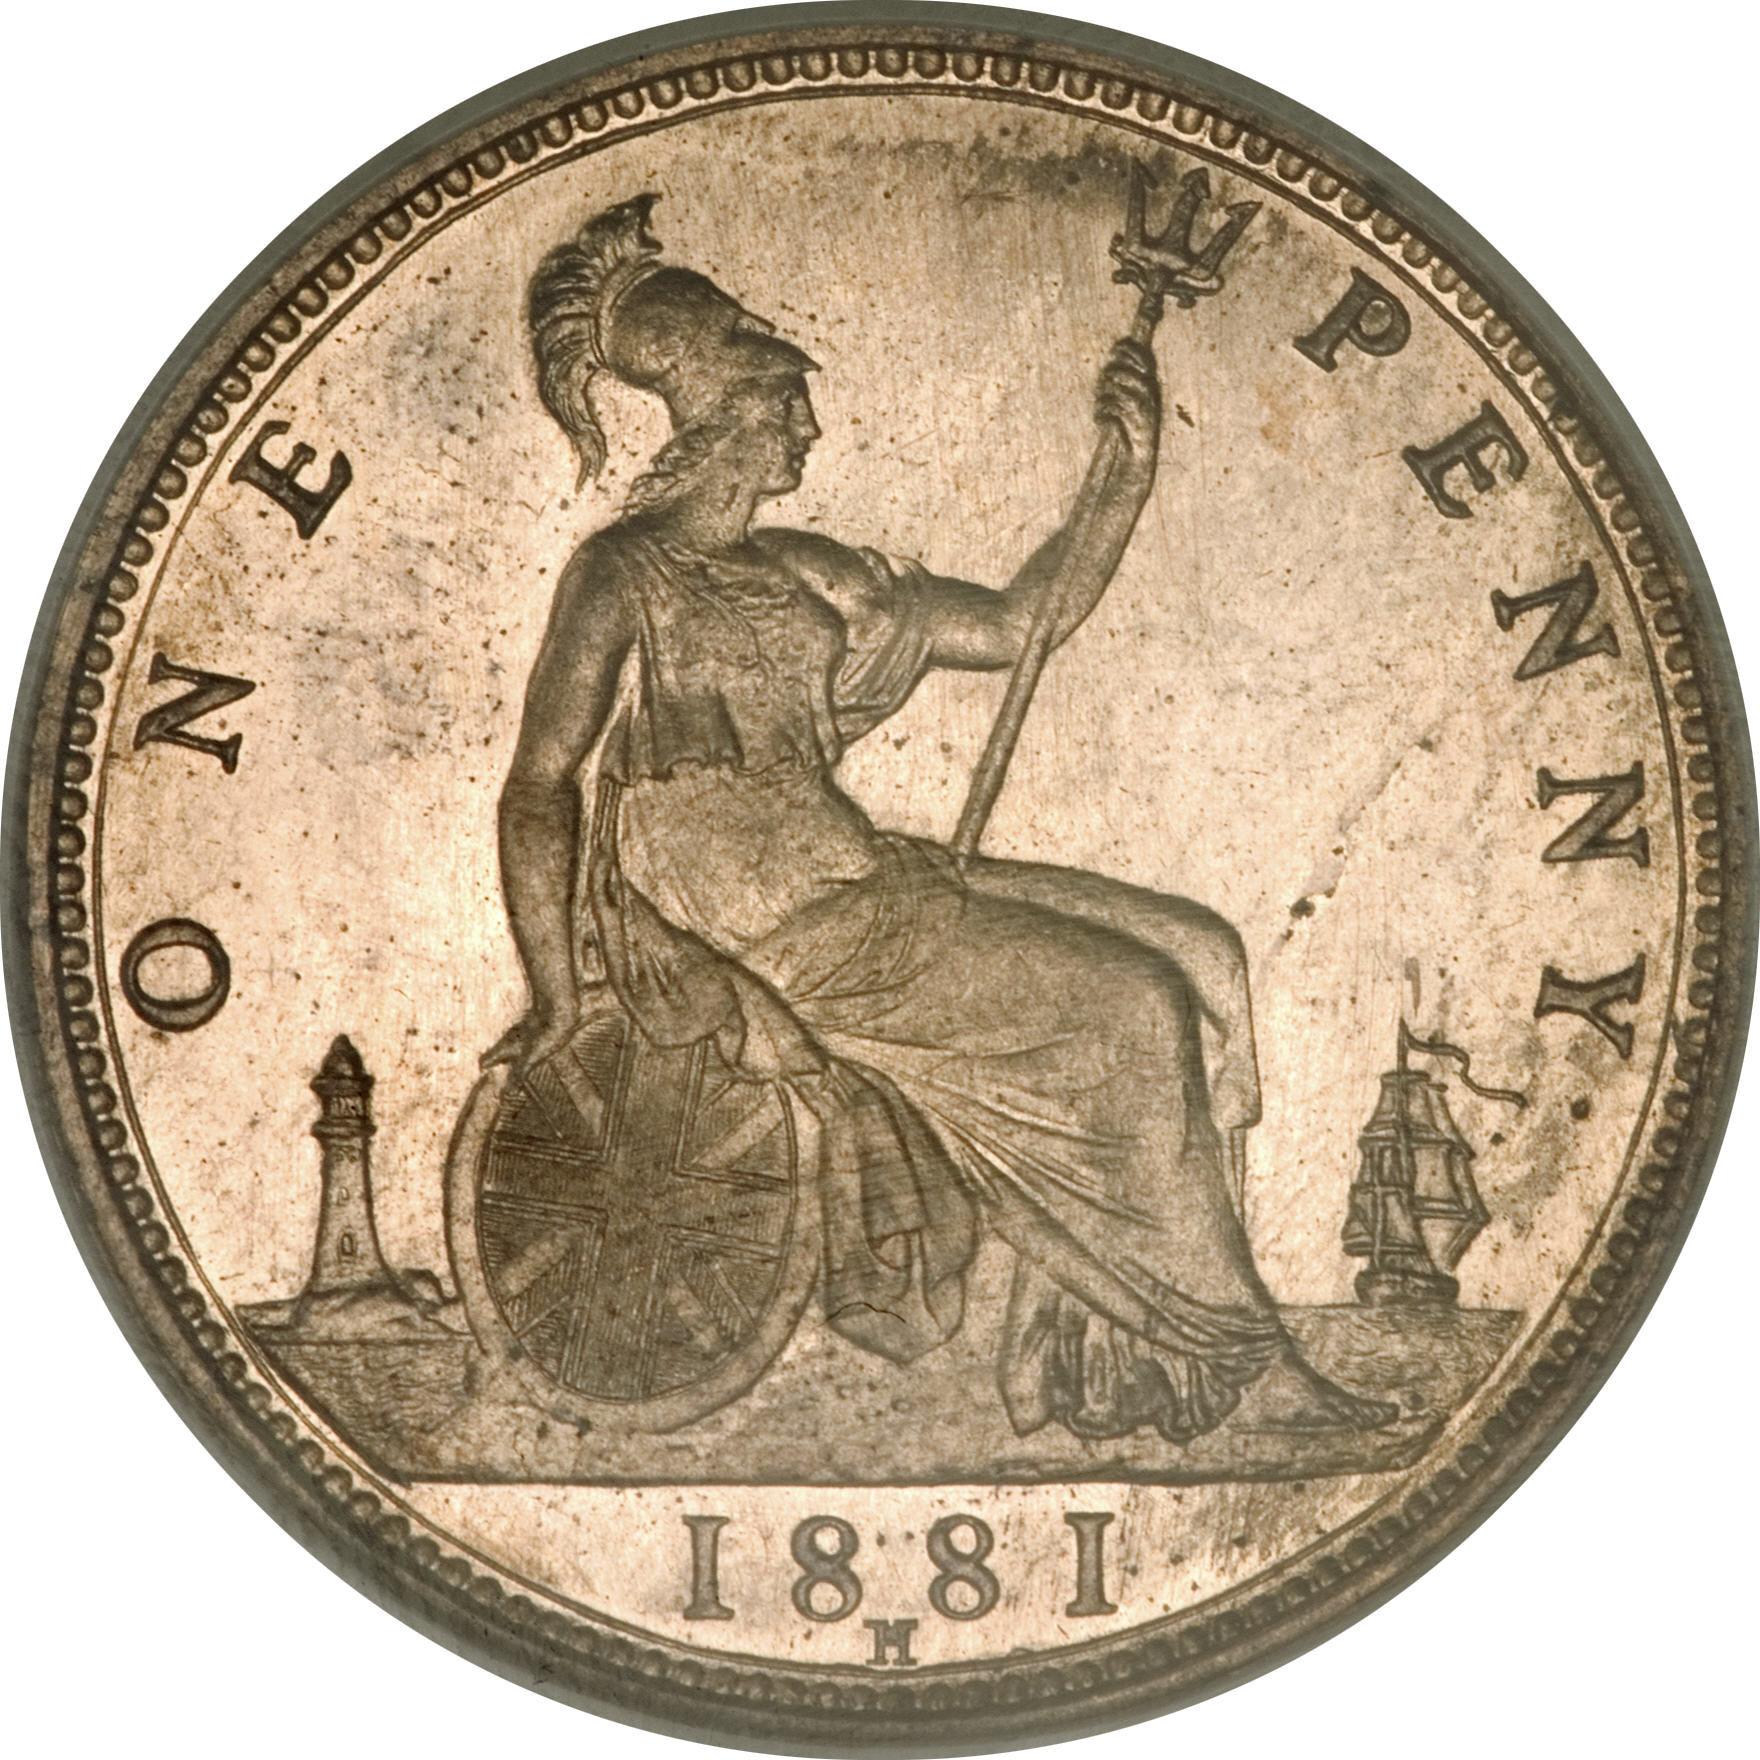 1 Penny - Victoria (2nd portrait) - United Kingdom – Numista